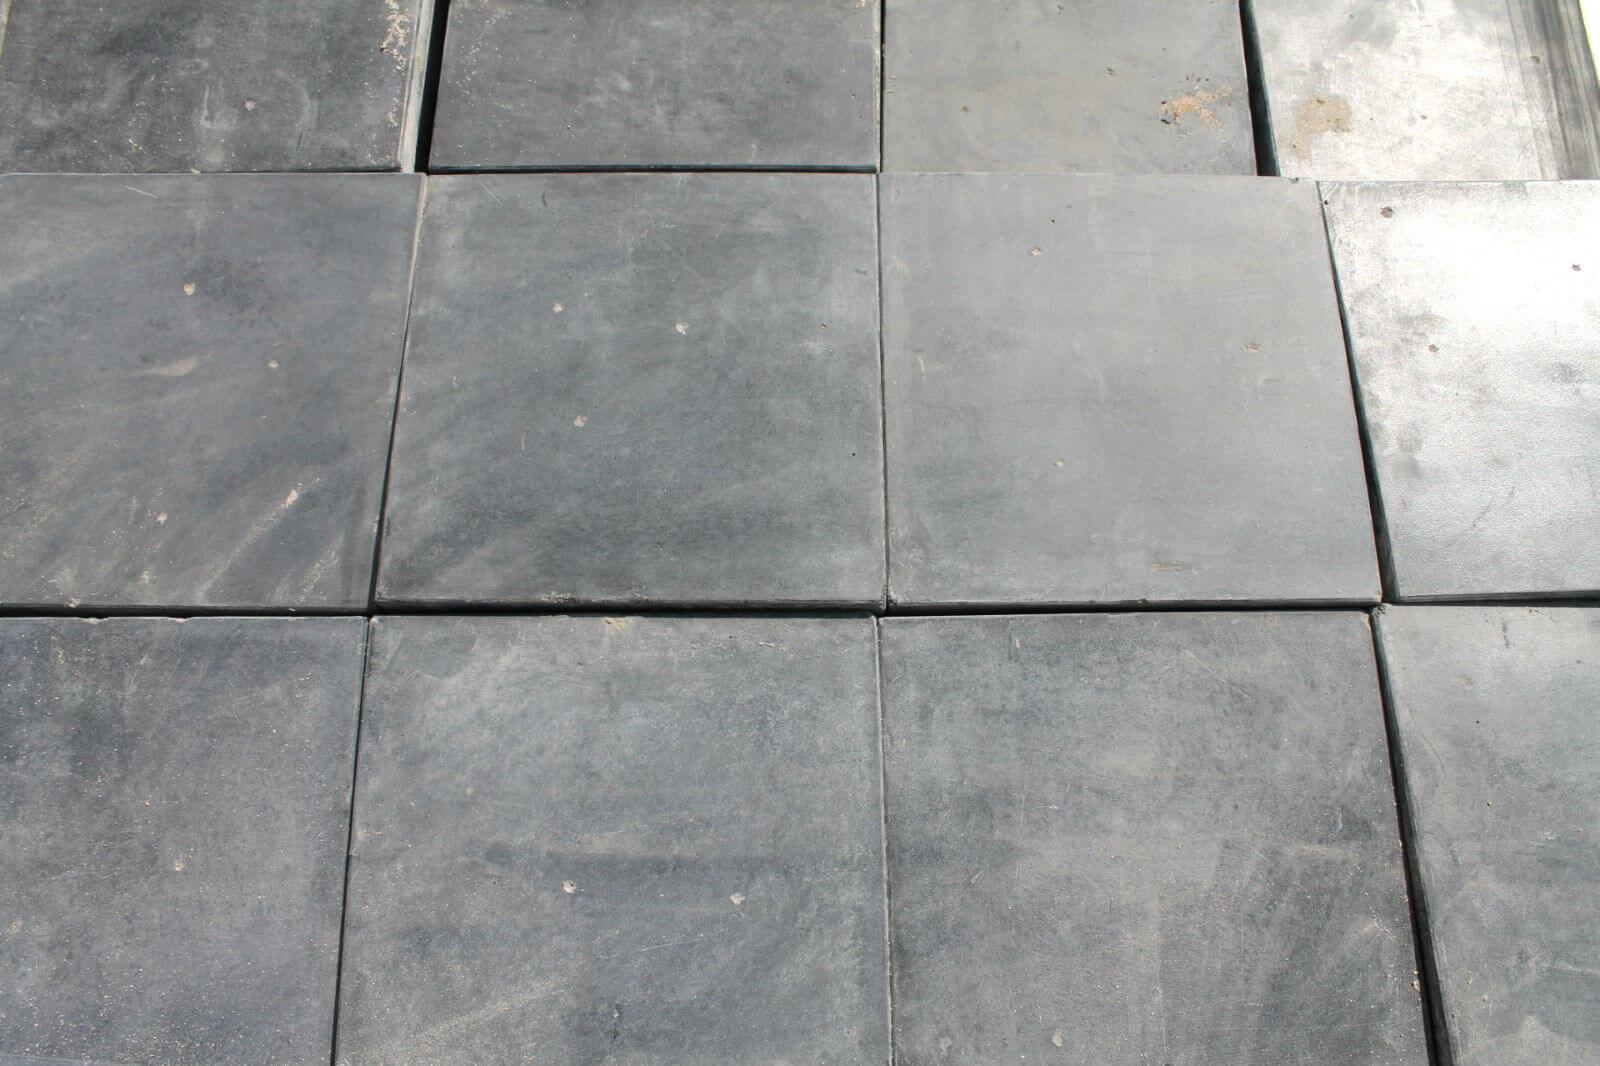 Reclaimed 9 x 9 Inch Blue Quarry Tiles